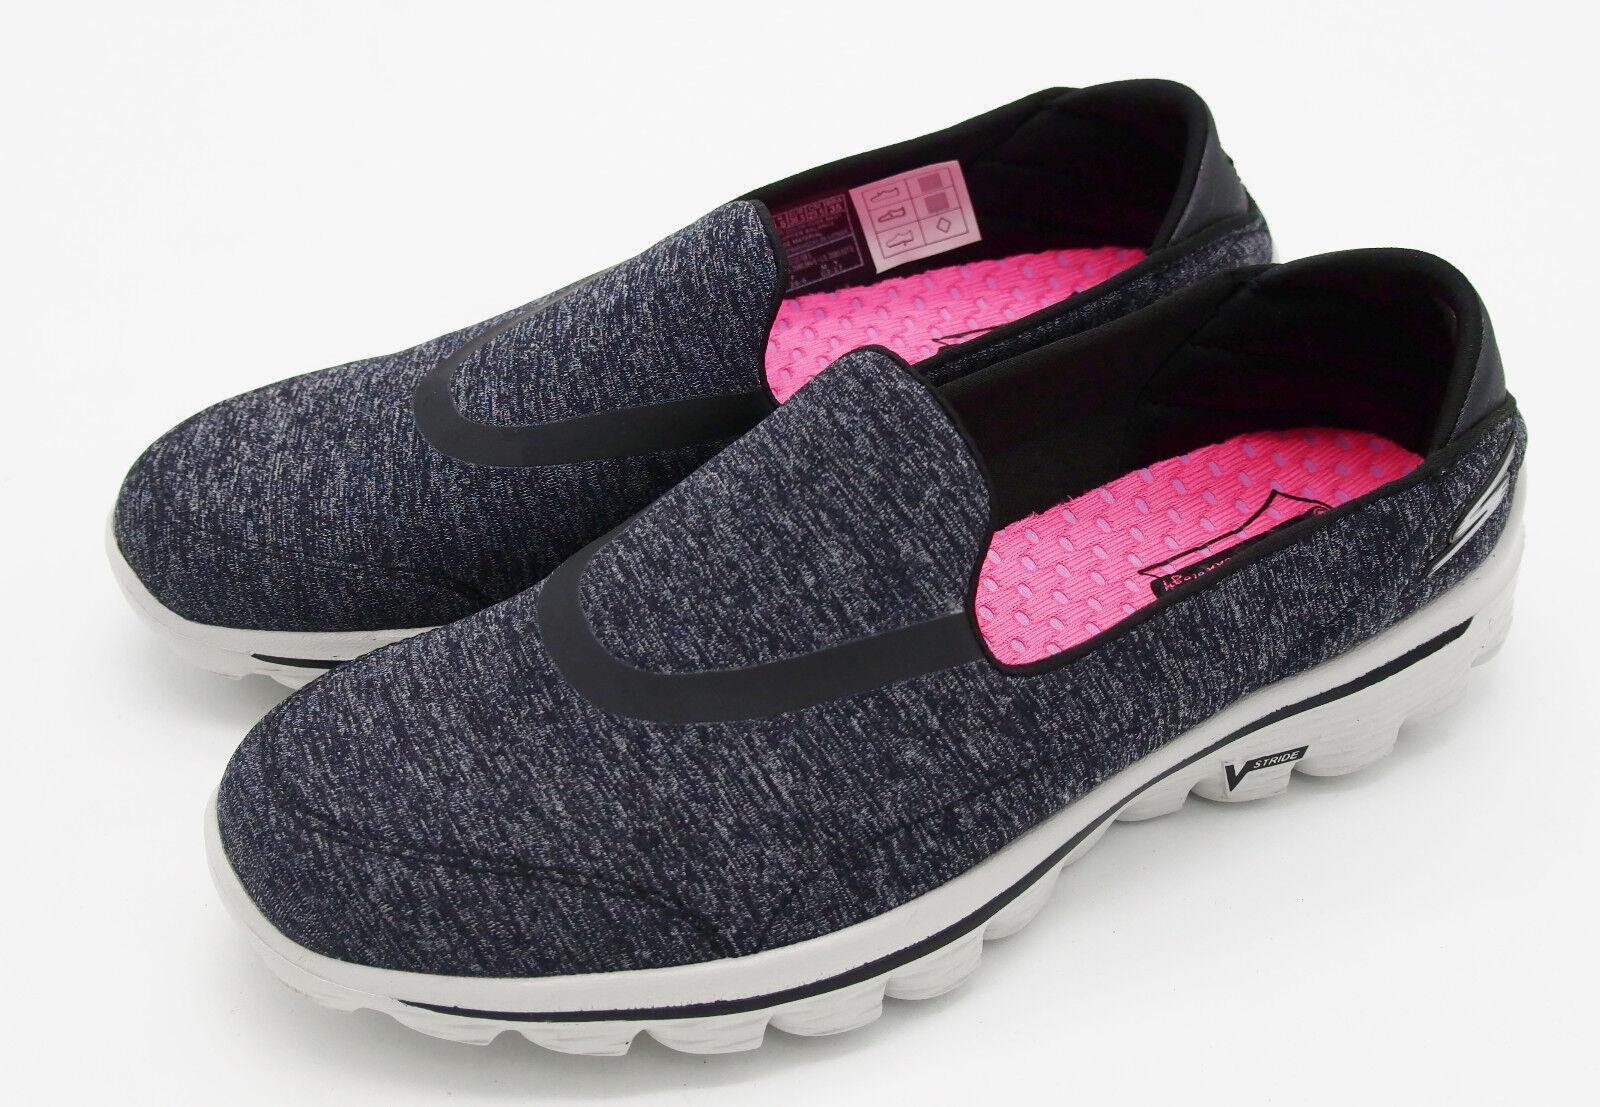 J5595 New Women's Skechers Go Walk Heather Charcoal Slip On shoes 8 M